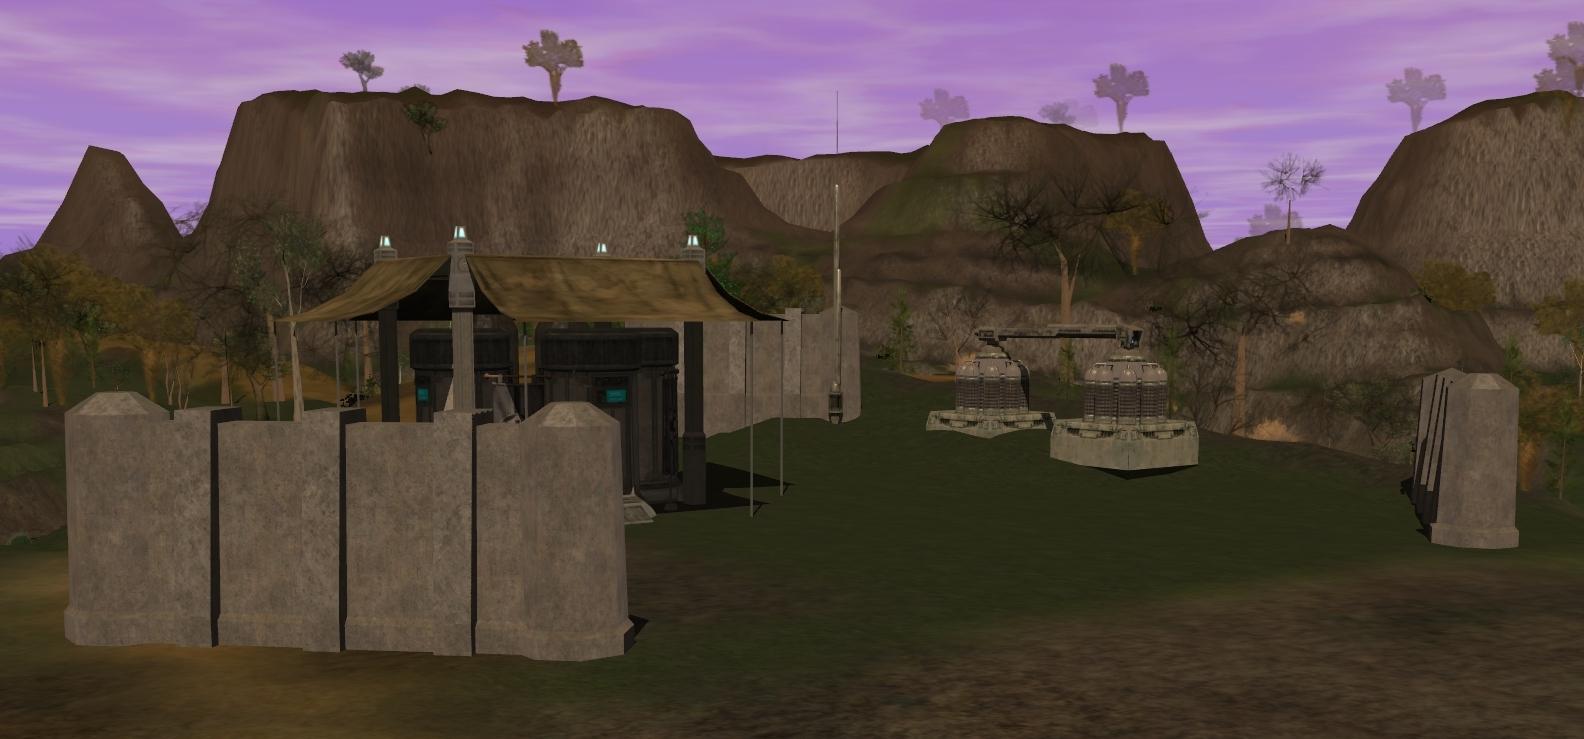 Imperial Forward Base Camp (Talus)